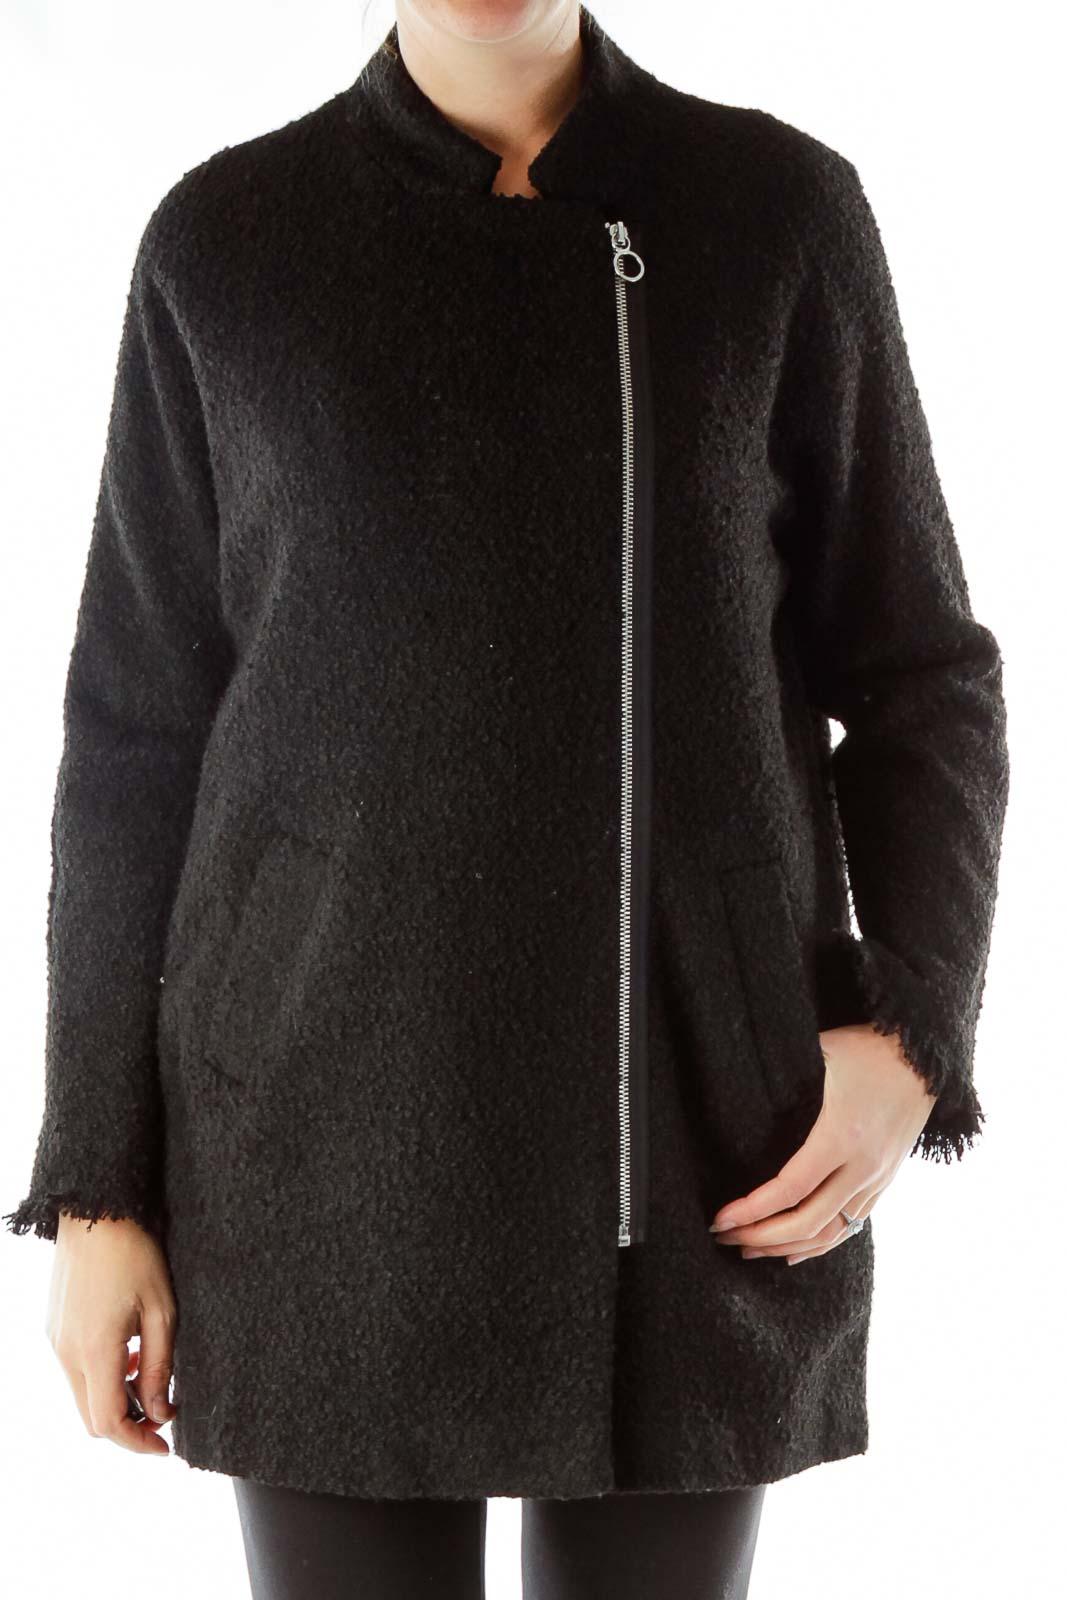 Black Zippered Coat